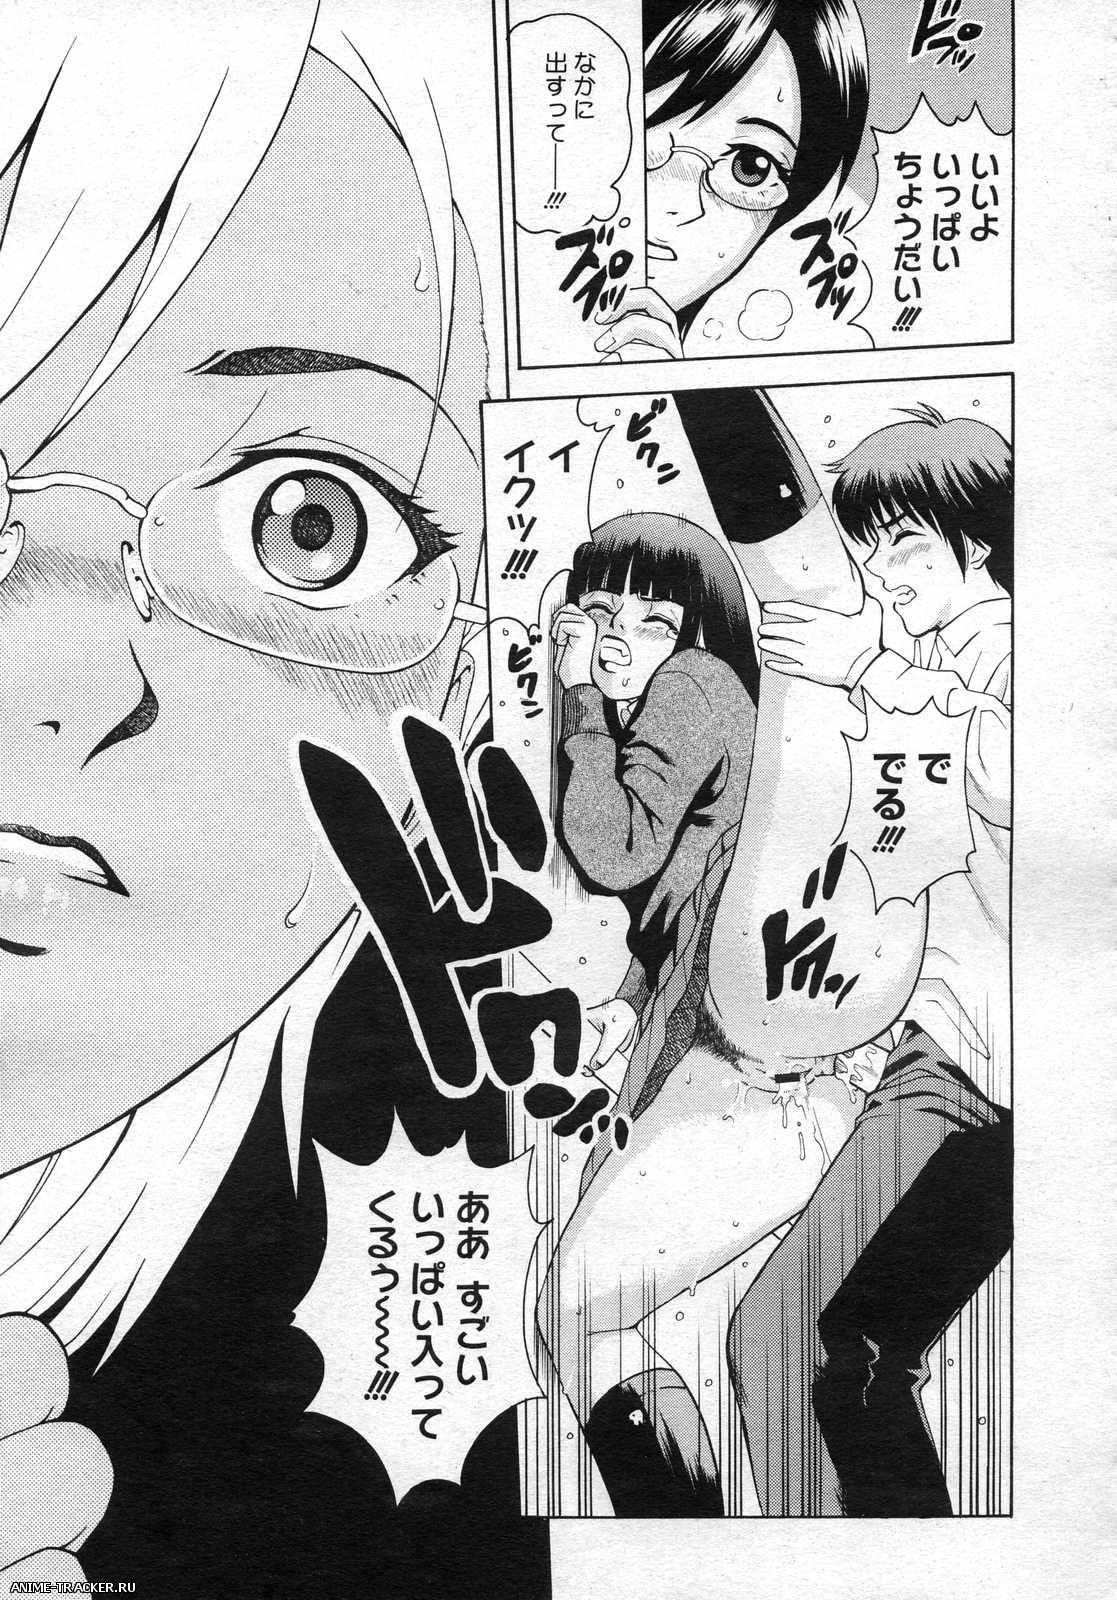 ������ COMIC Megastore H [2002-2013] [Cen] [JAP] Manga Hentai